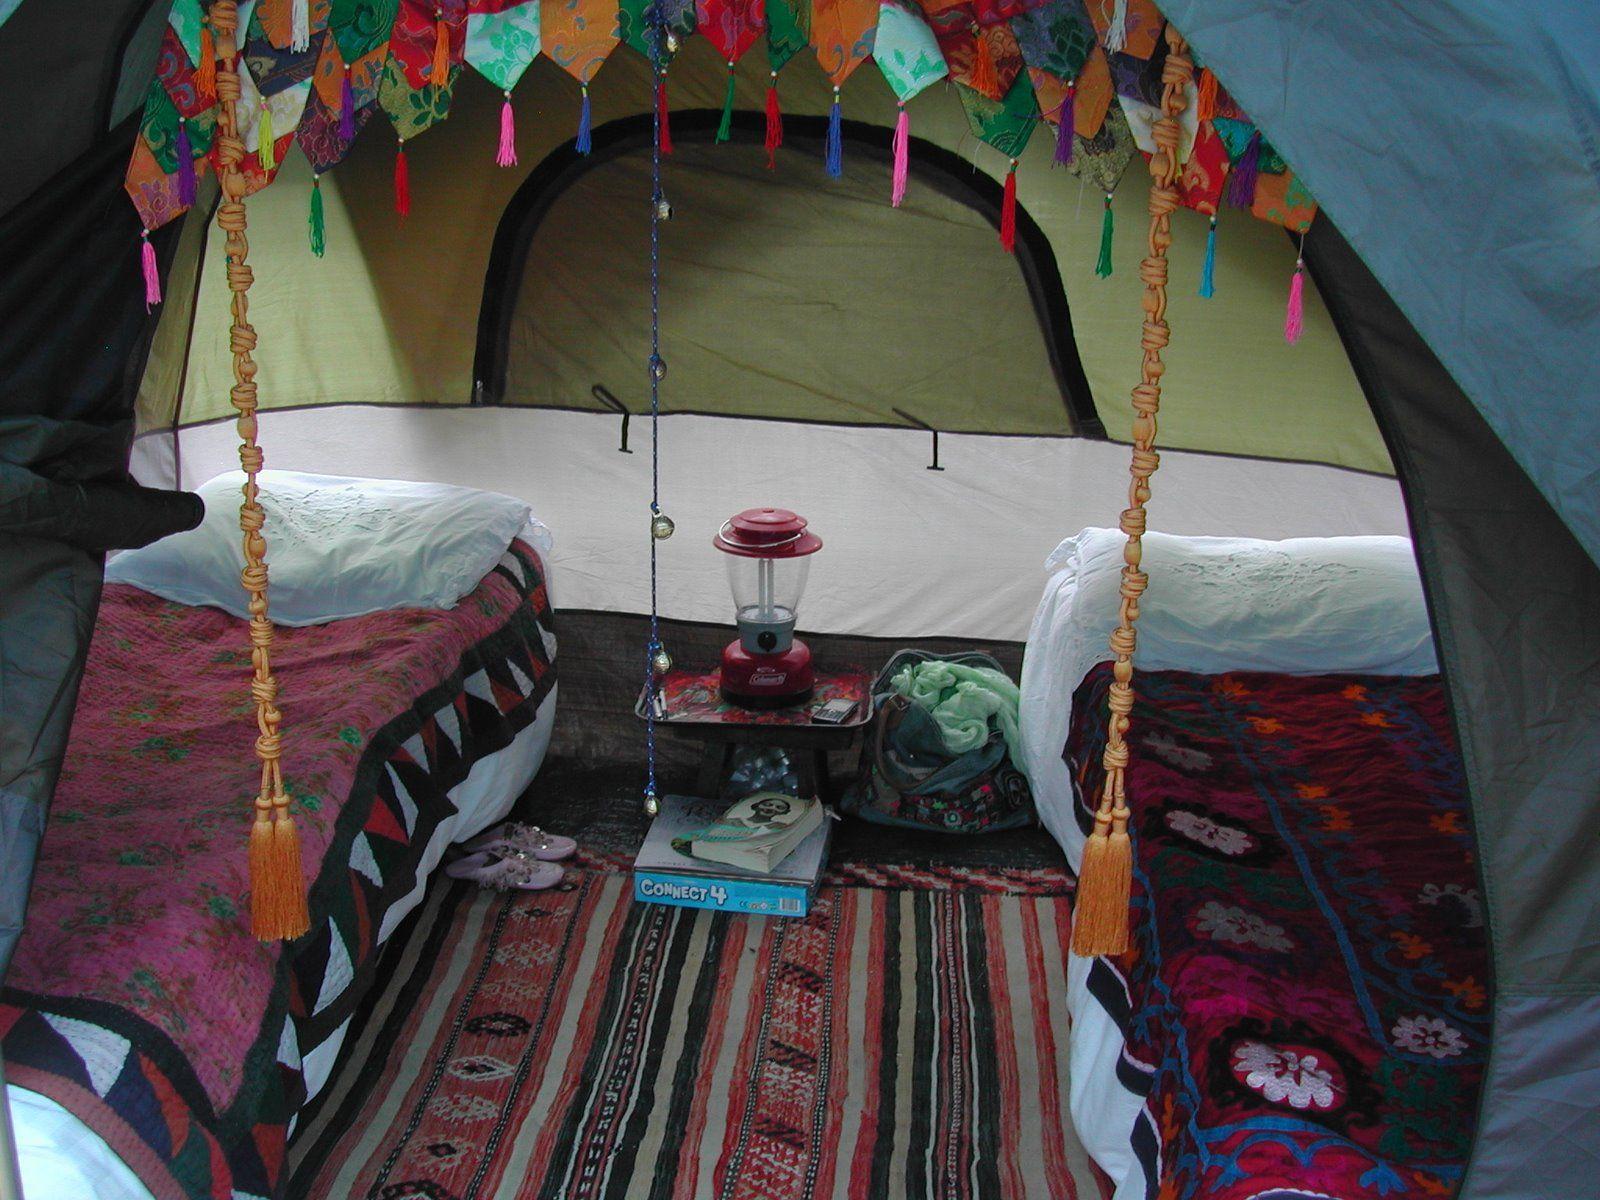 Regular Tent Glamping Tent Decorations Camping Tent